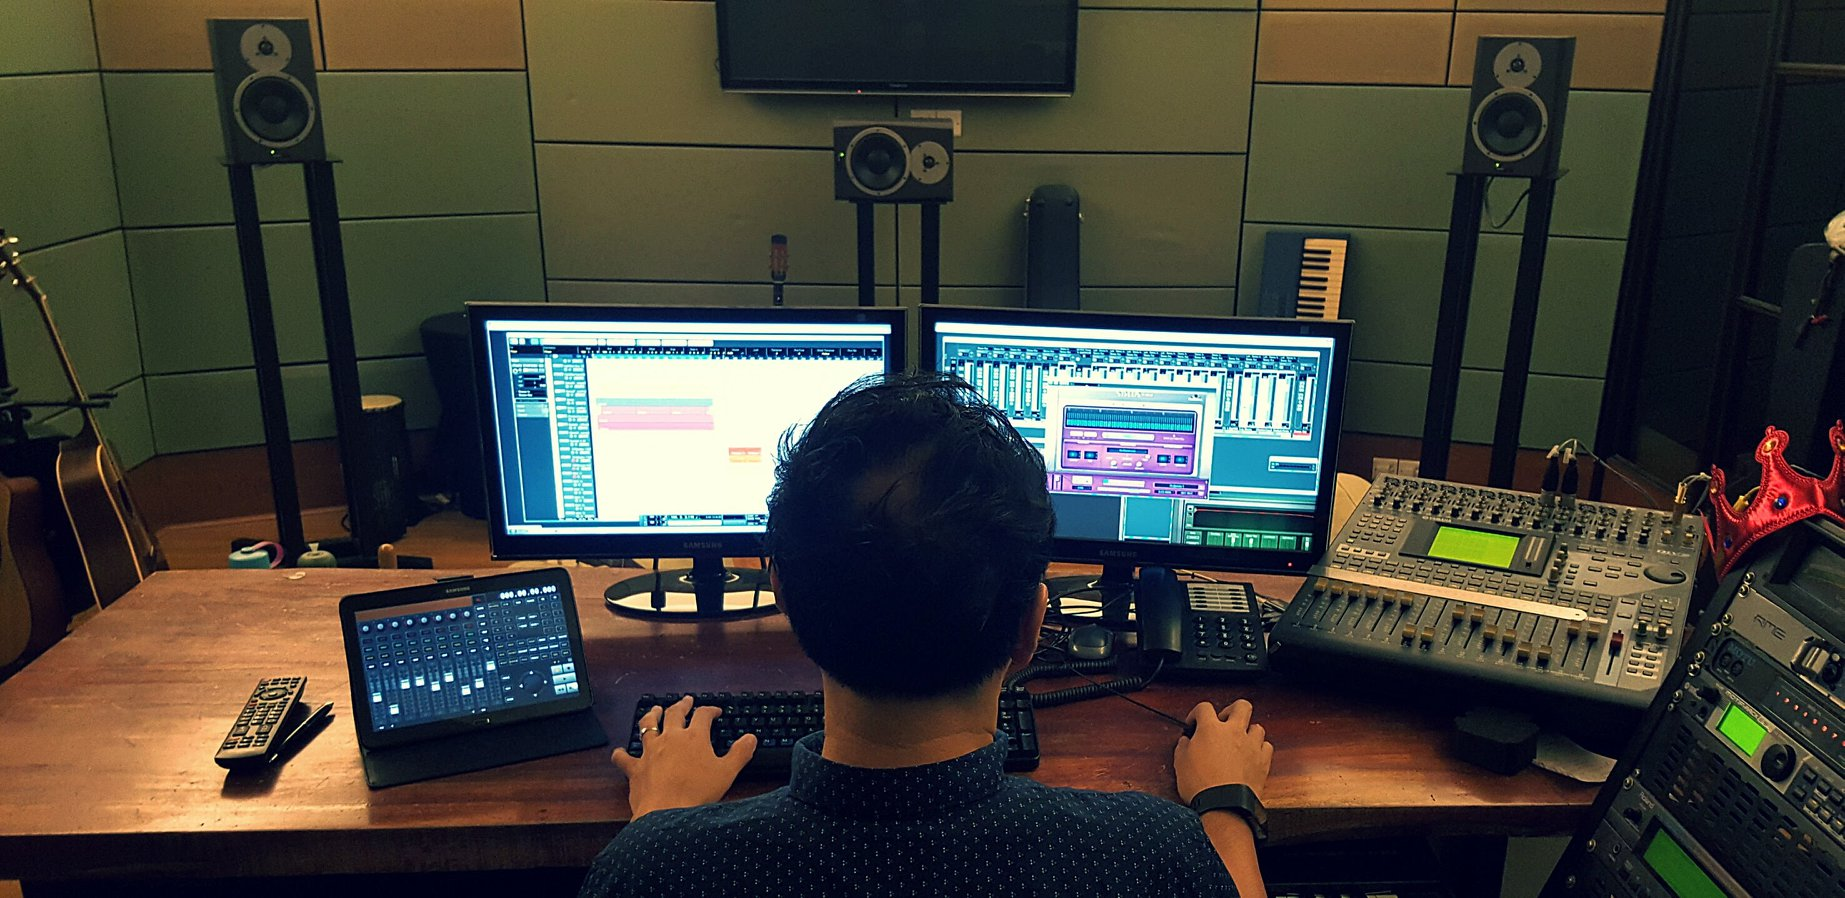 Jinx Chin composing some new musical tracks.